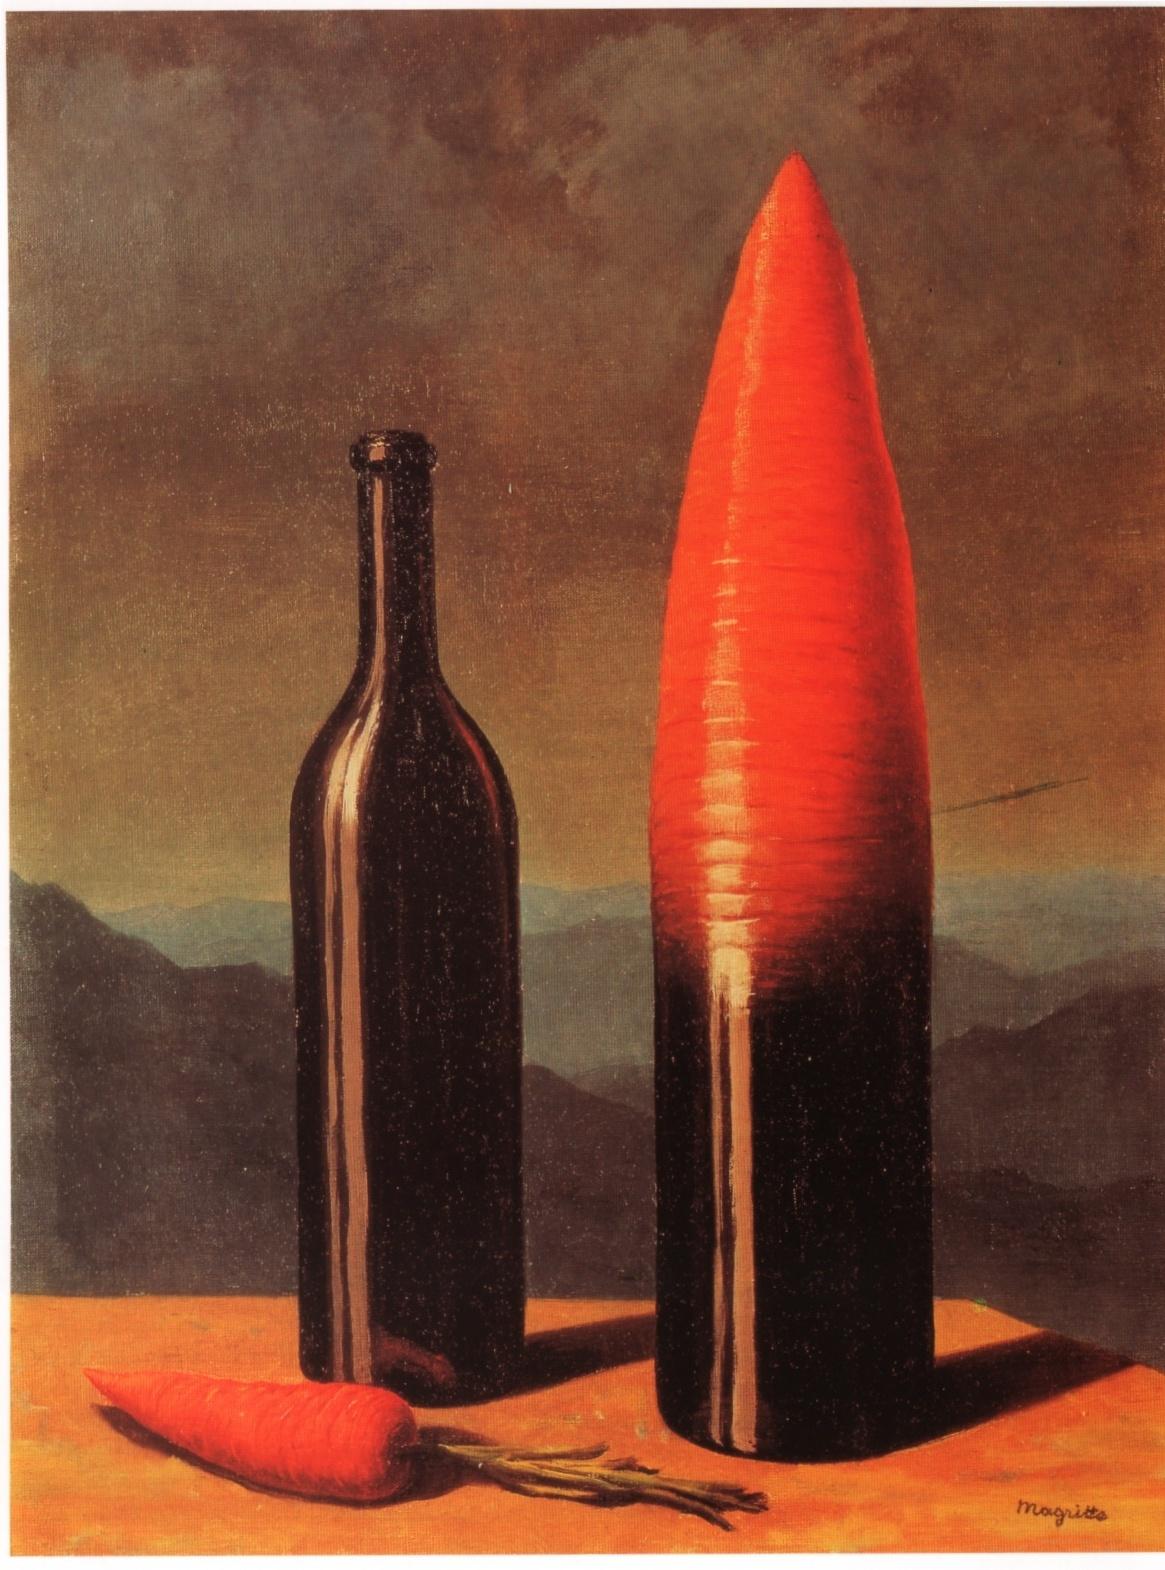 Magritte | kalafudra's Stuff